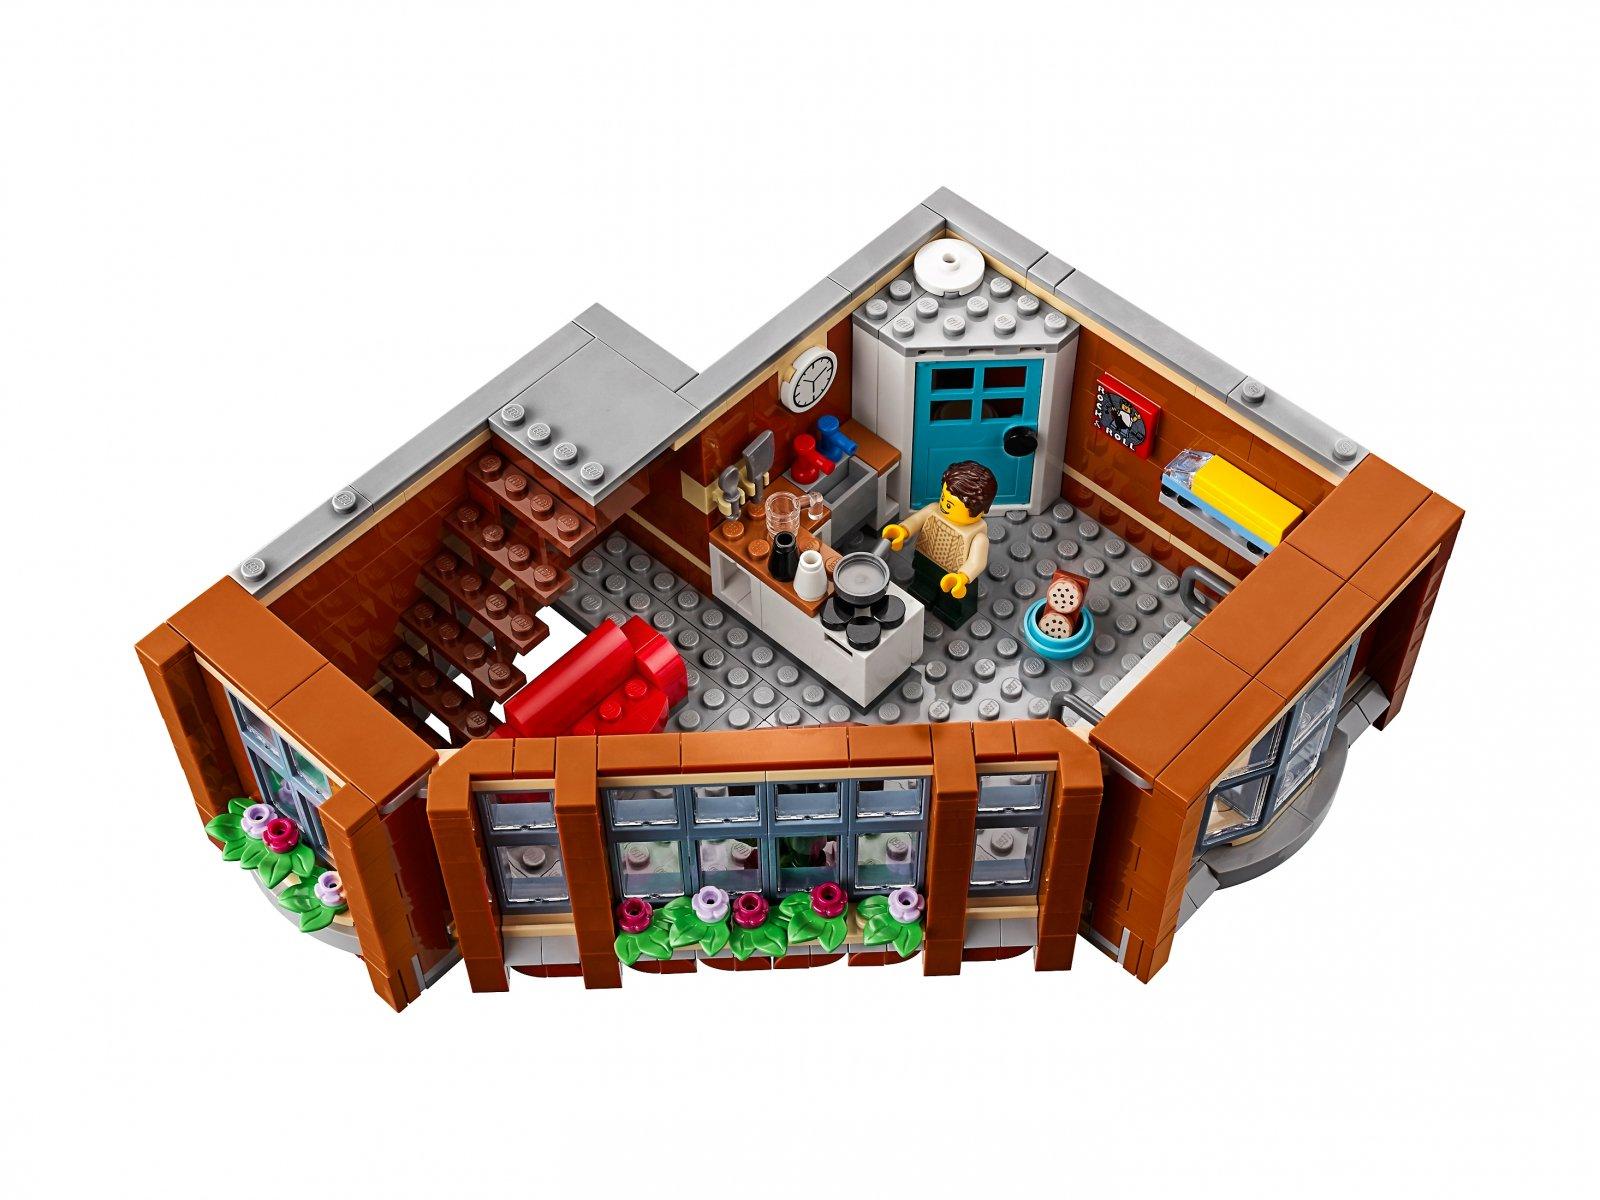 LEGO 10264 Creator Expert Warsztat na rogu